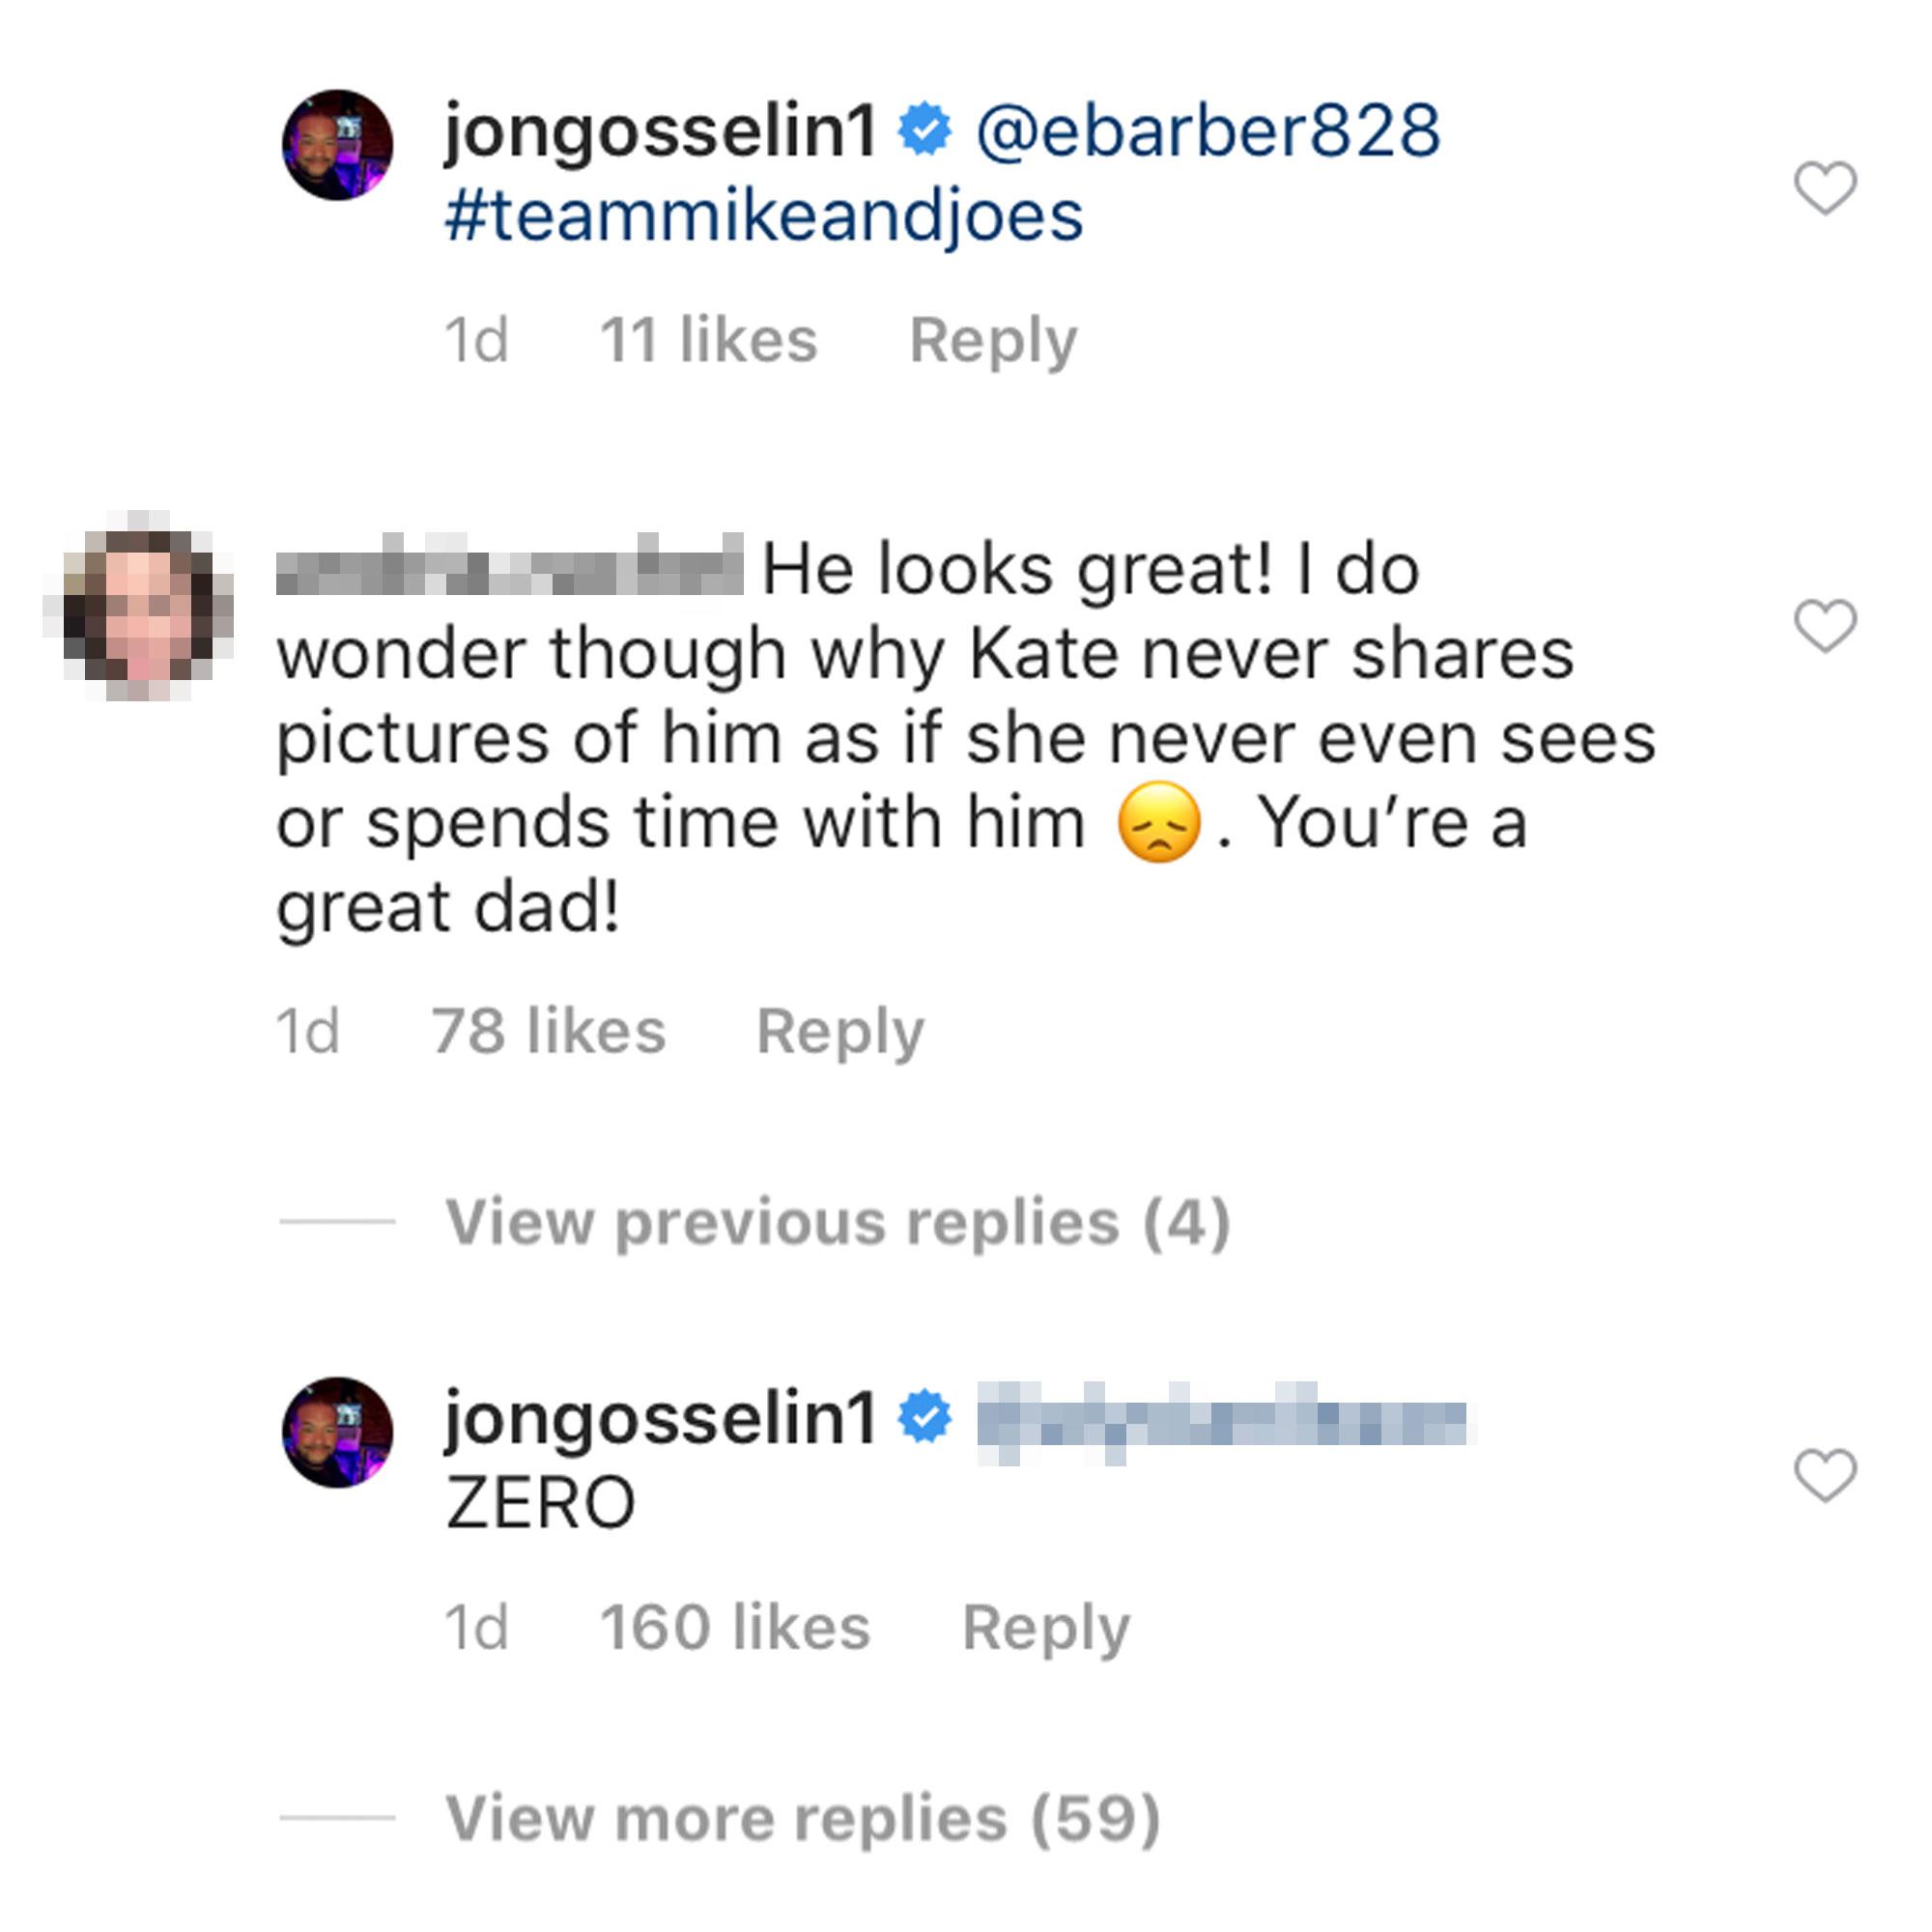 Jon Gosselin Claims Ex Kate Gosselin Has 'Zero' Interaction With Their Son Collin - Jon Gosselin's comment